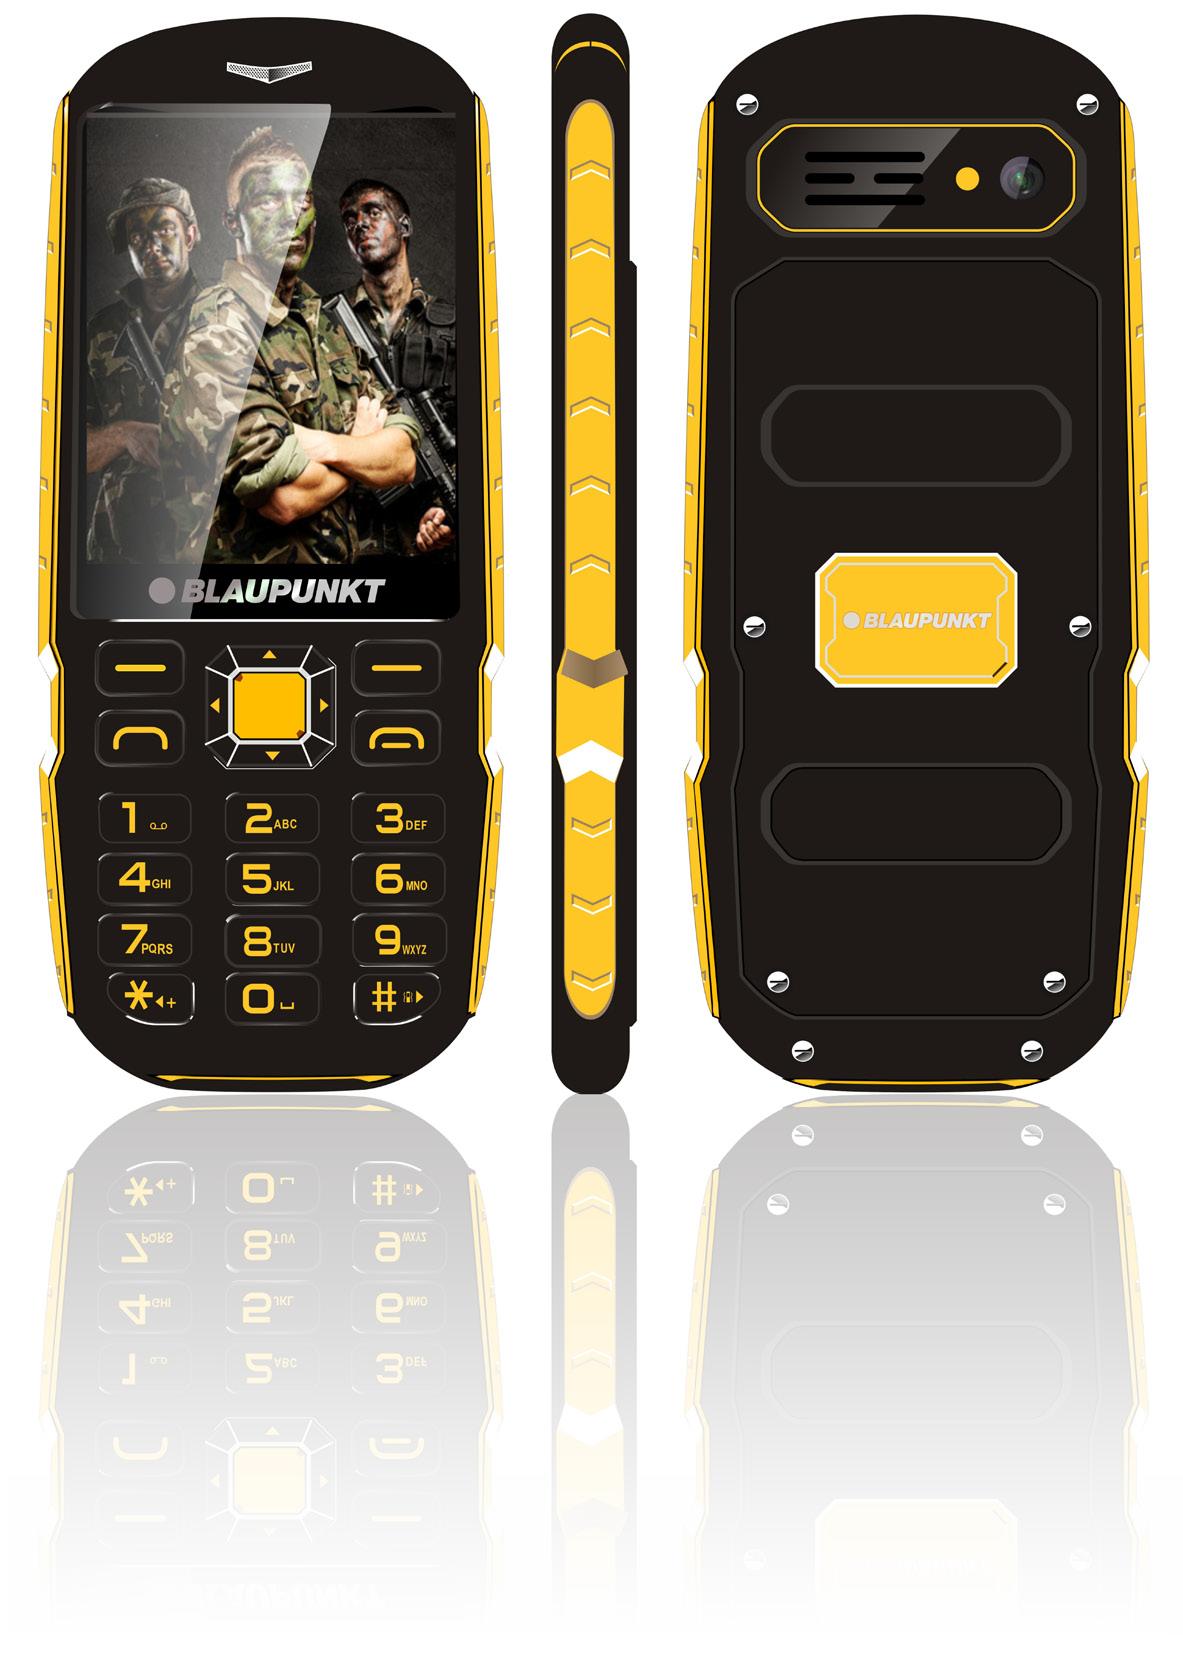 BLAUPUNKT RS01 IP57 RUGGED PHONE